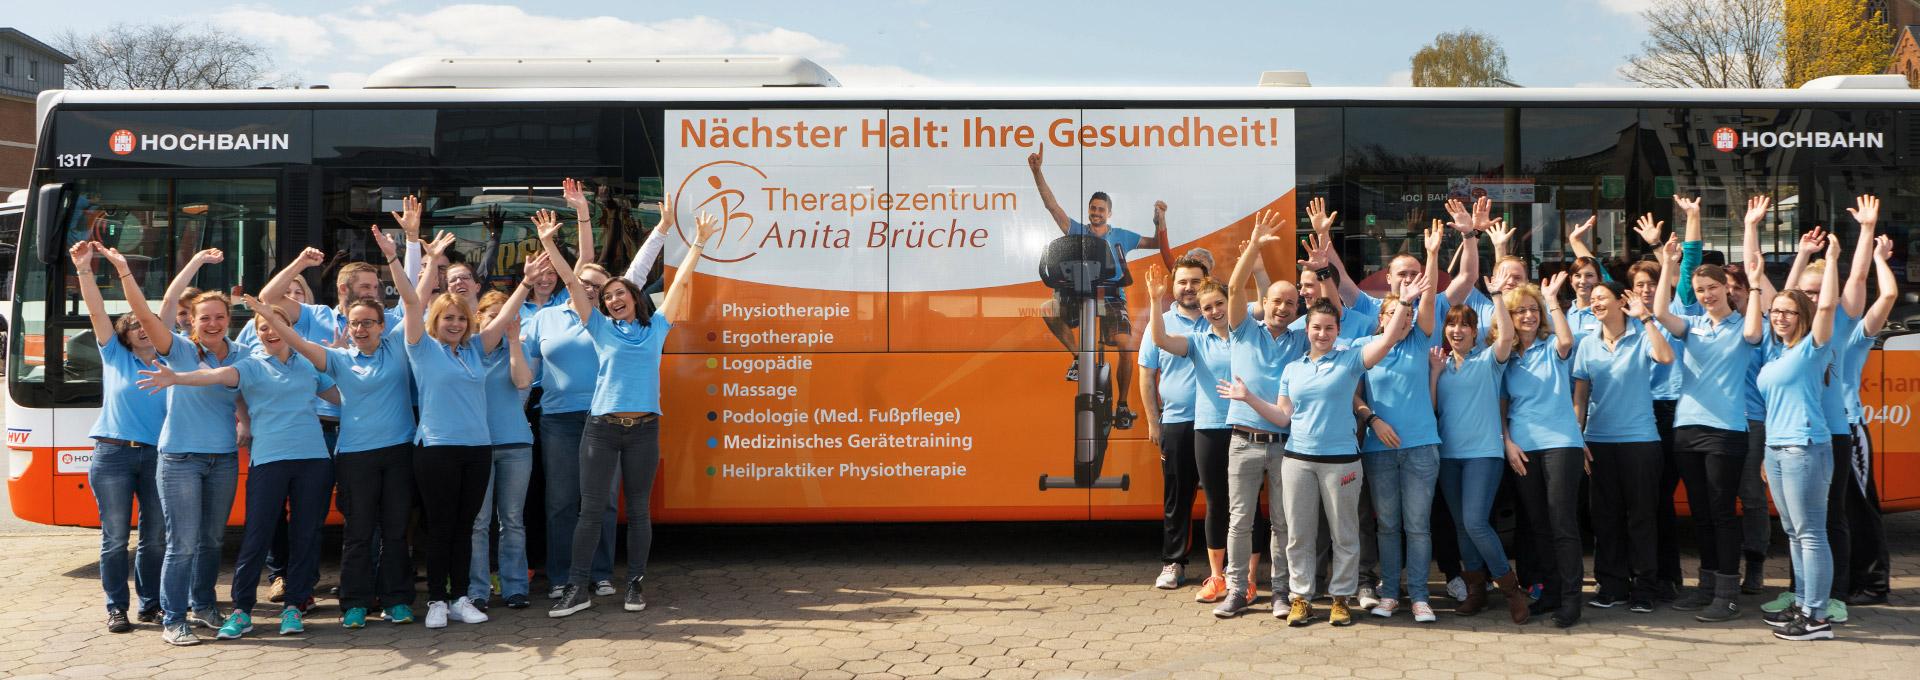 1920x680 Bus Team Therapiezentrum Hamburg